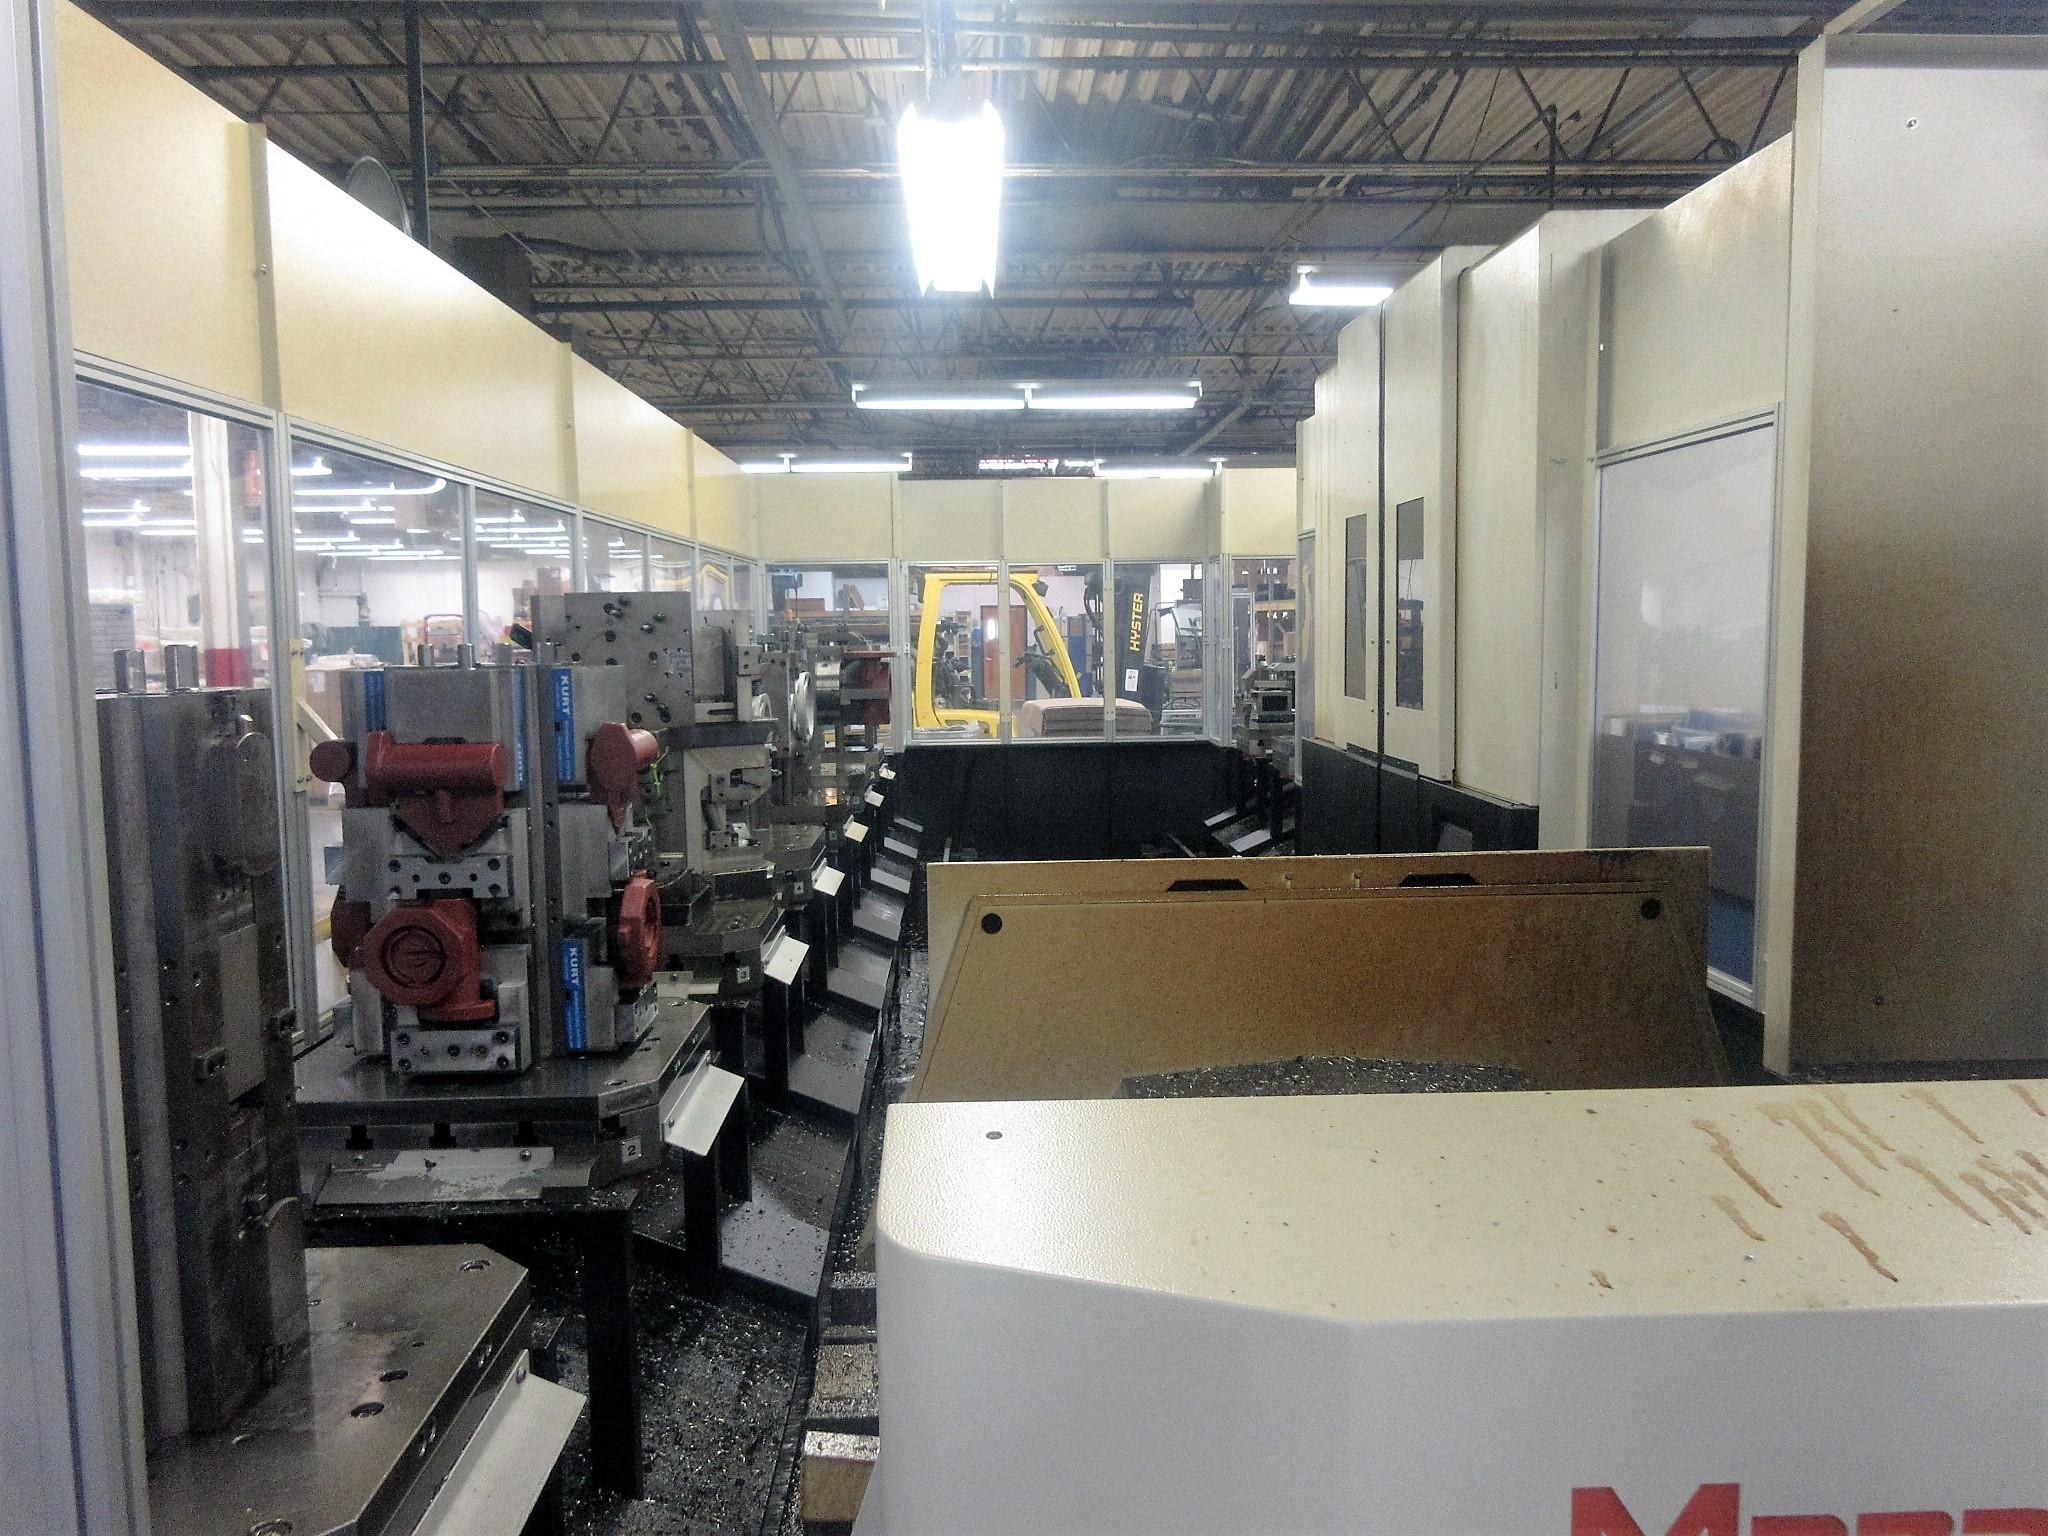 Mazak HCN-6000-II CNC Horizontal Machining Center With Palletech System - Image 11 of 22